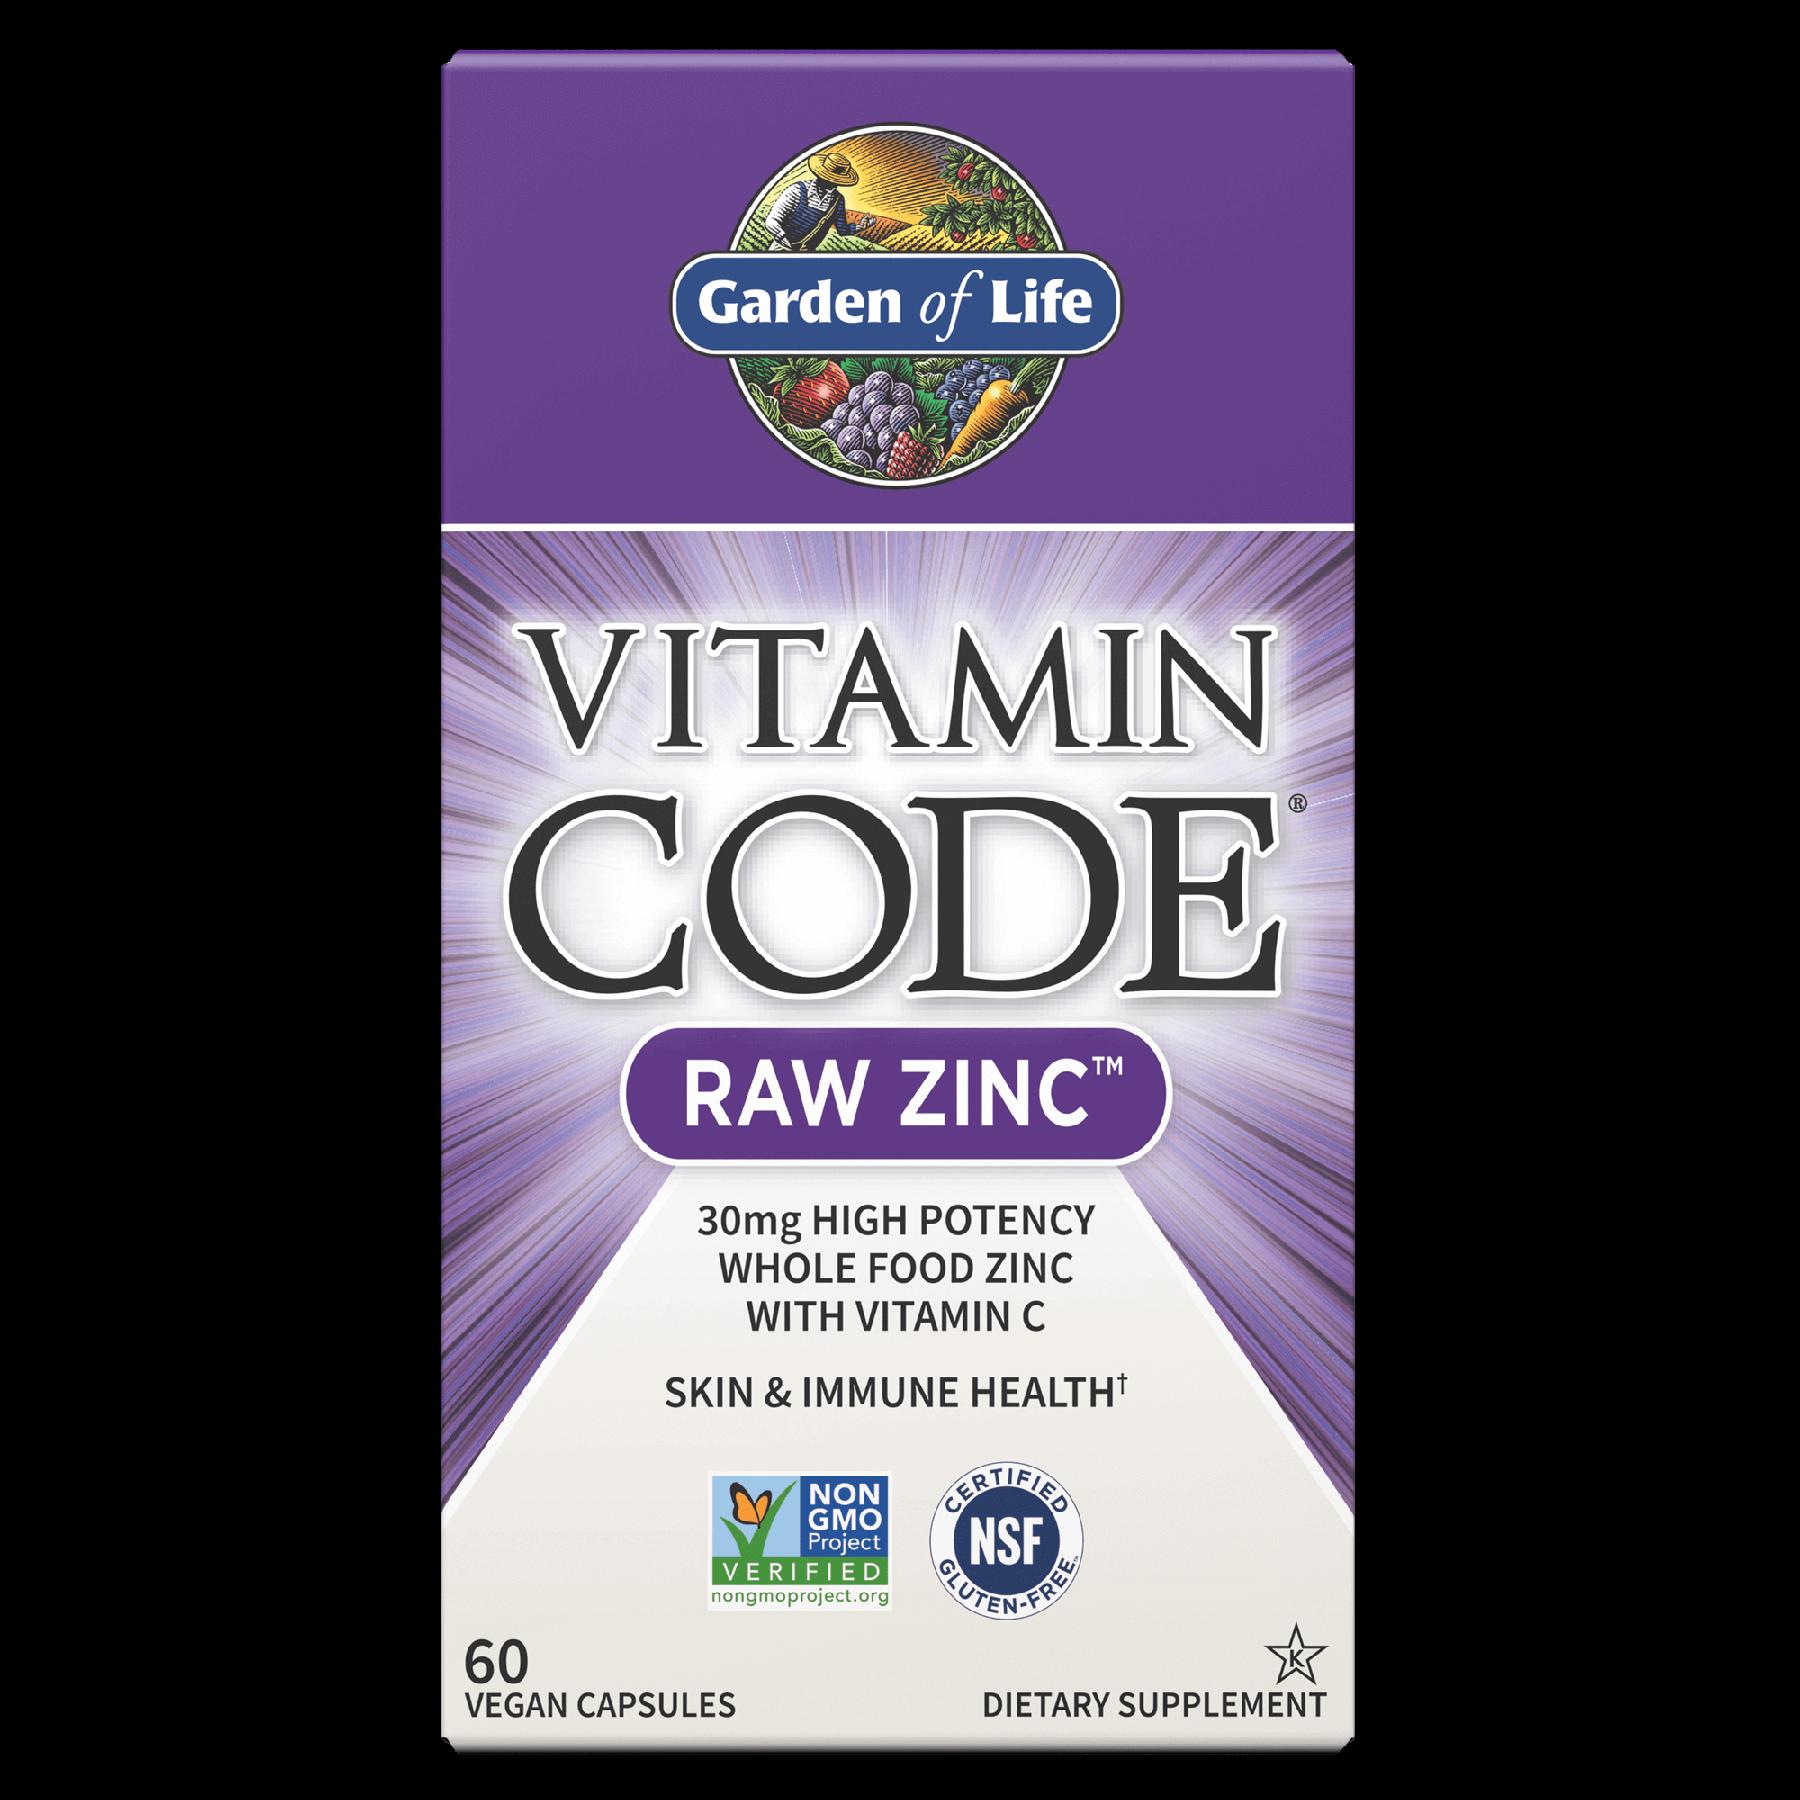 Vitamin Code Raw Zinc 60 Vegan Capsules